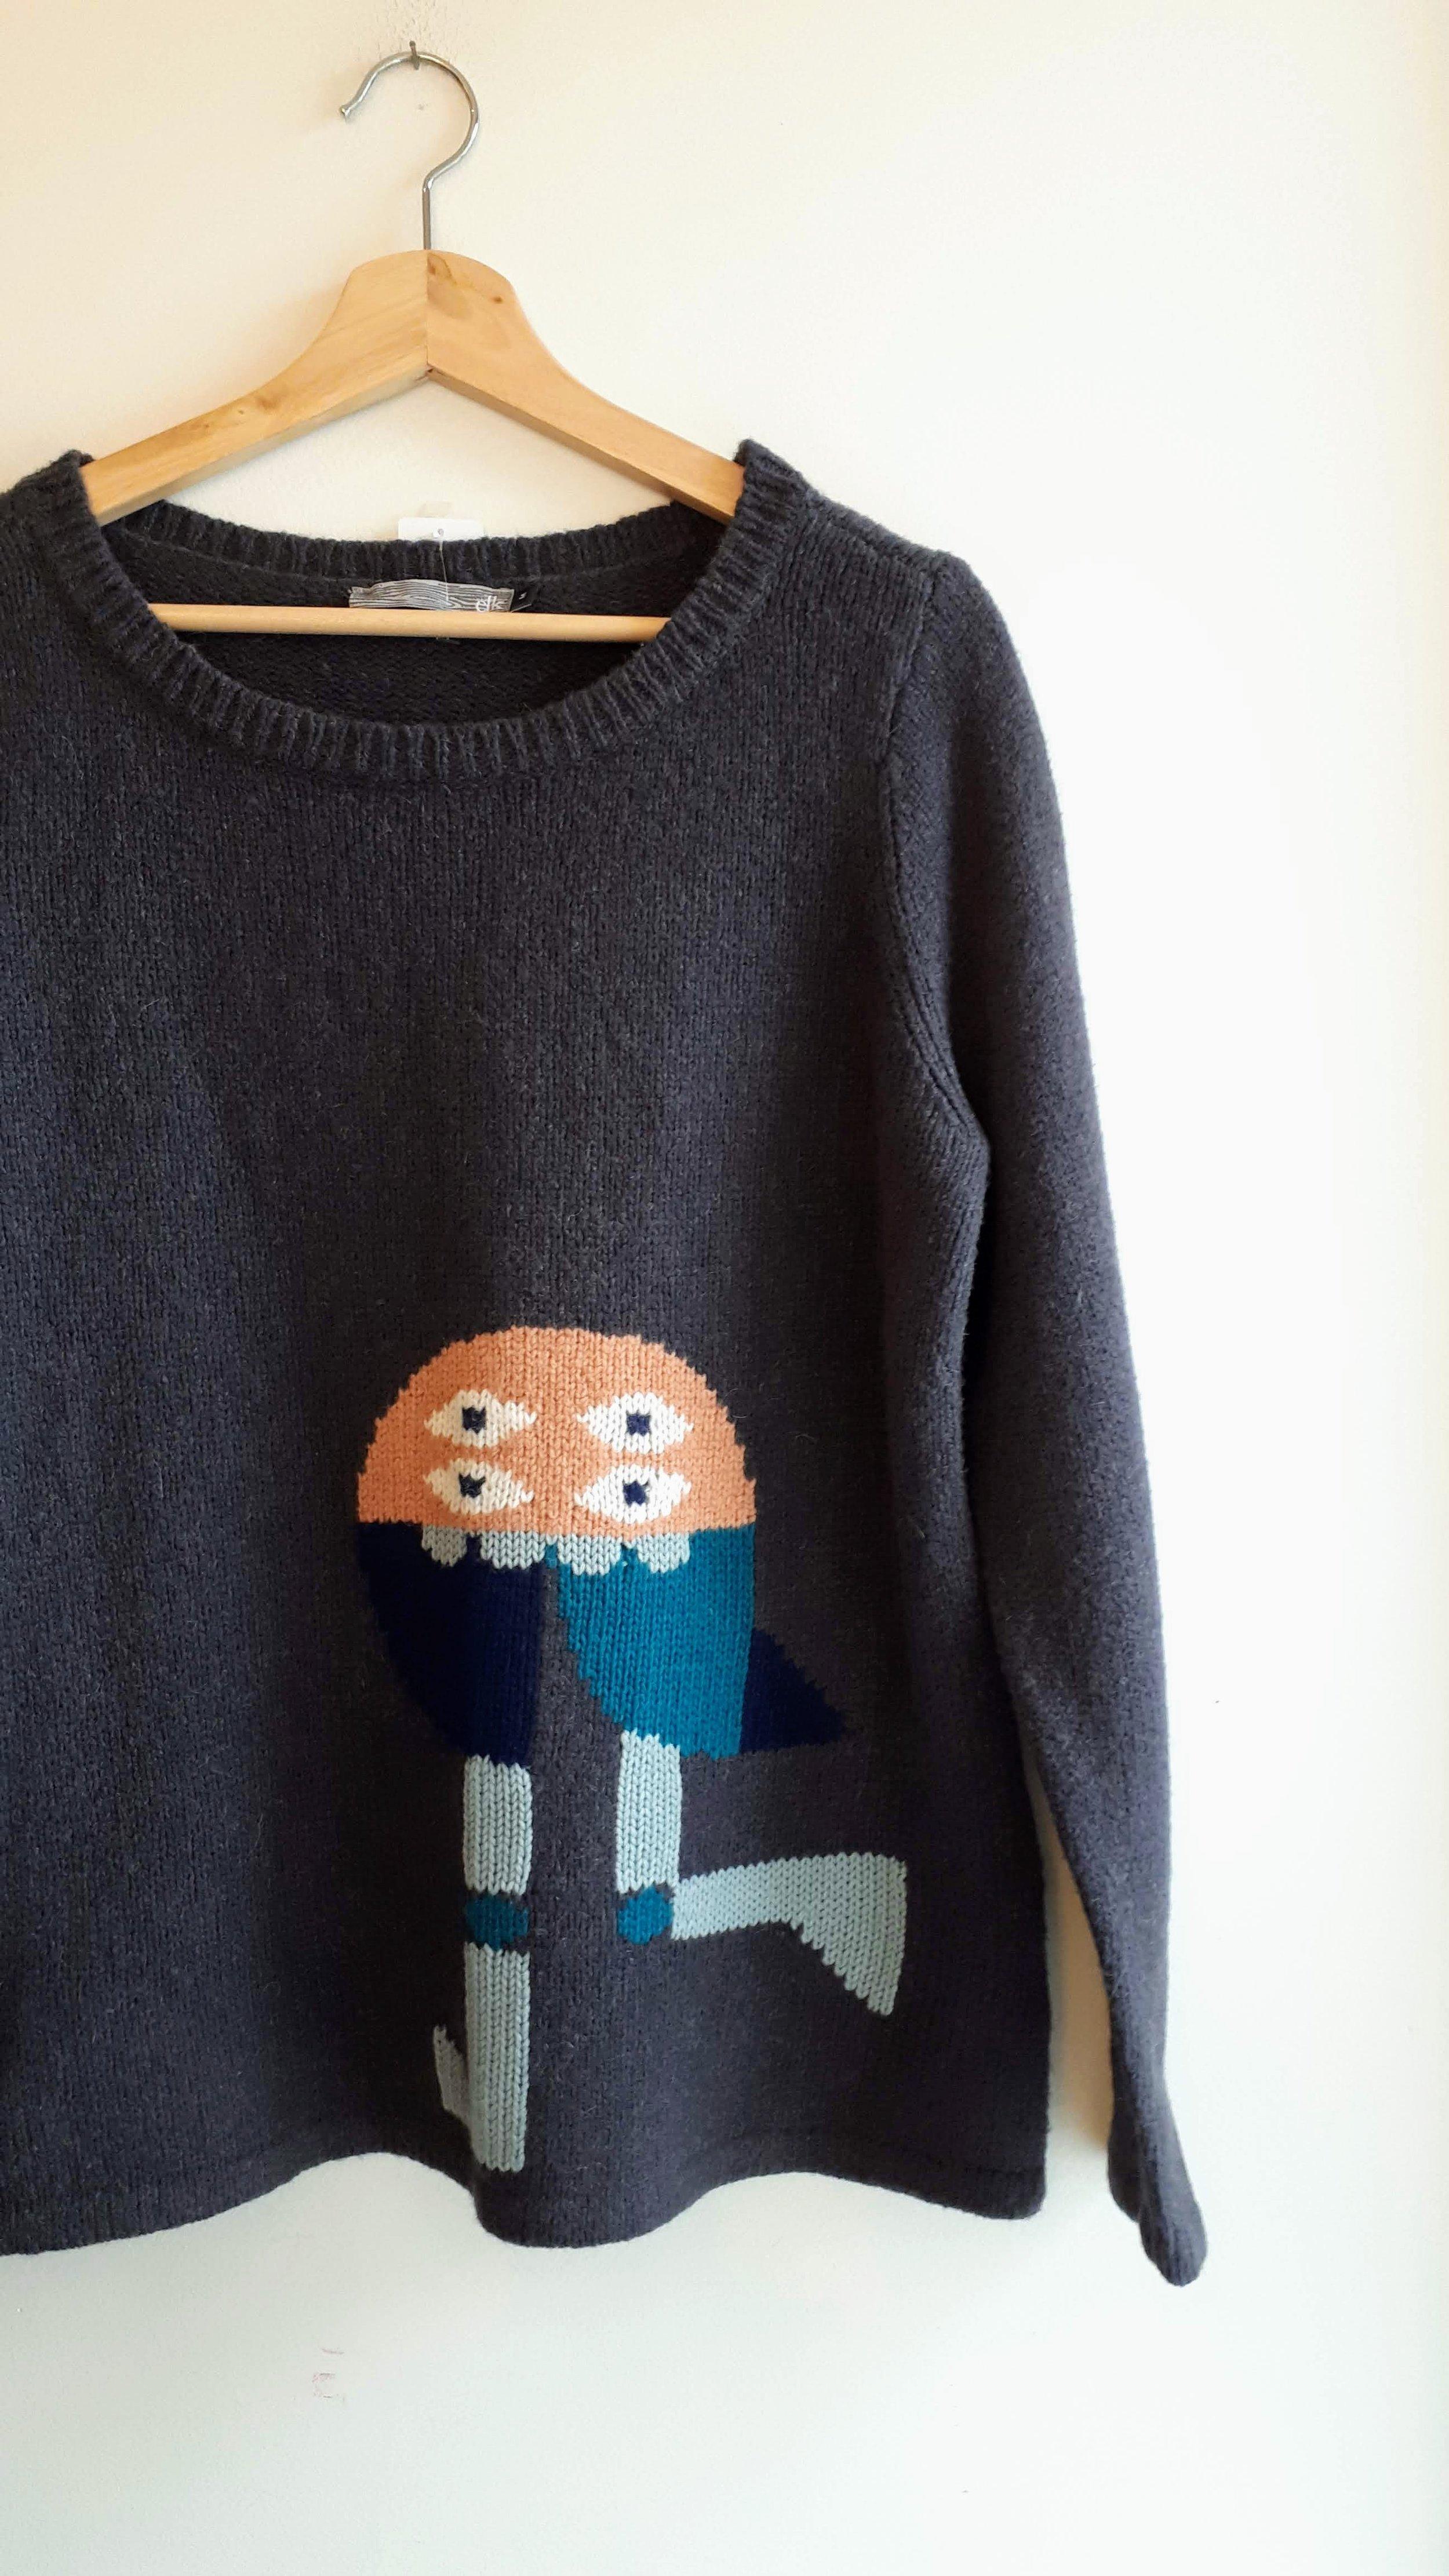 Elk sweater; Size M, $30